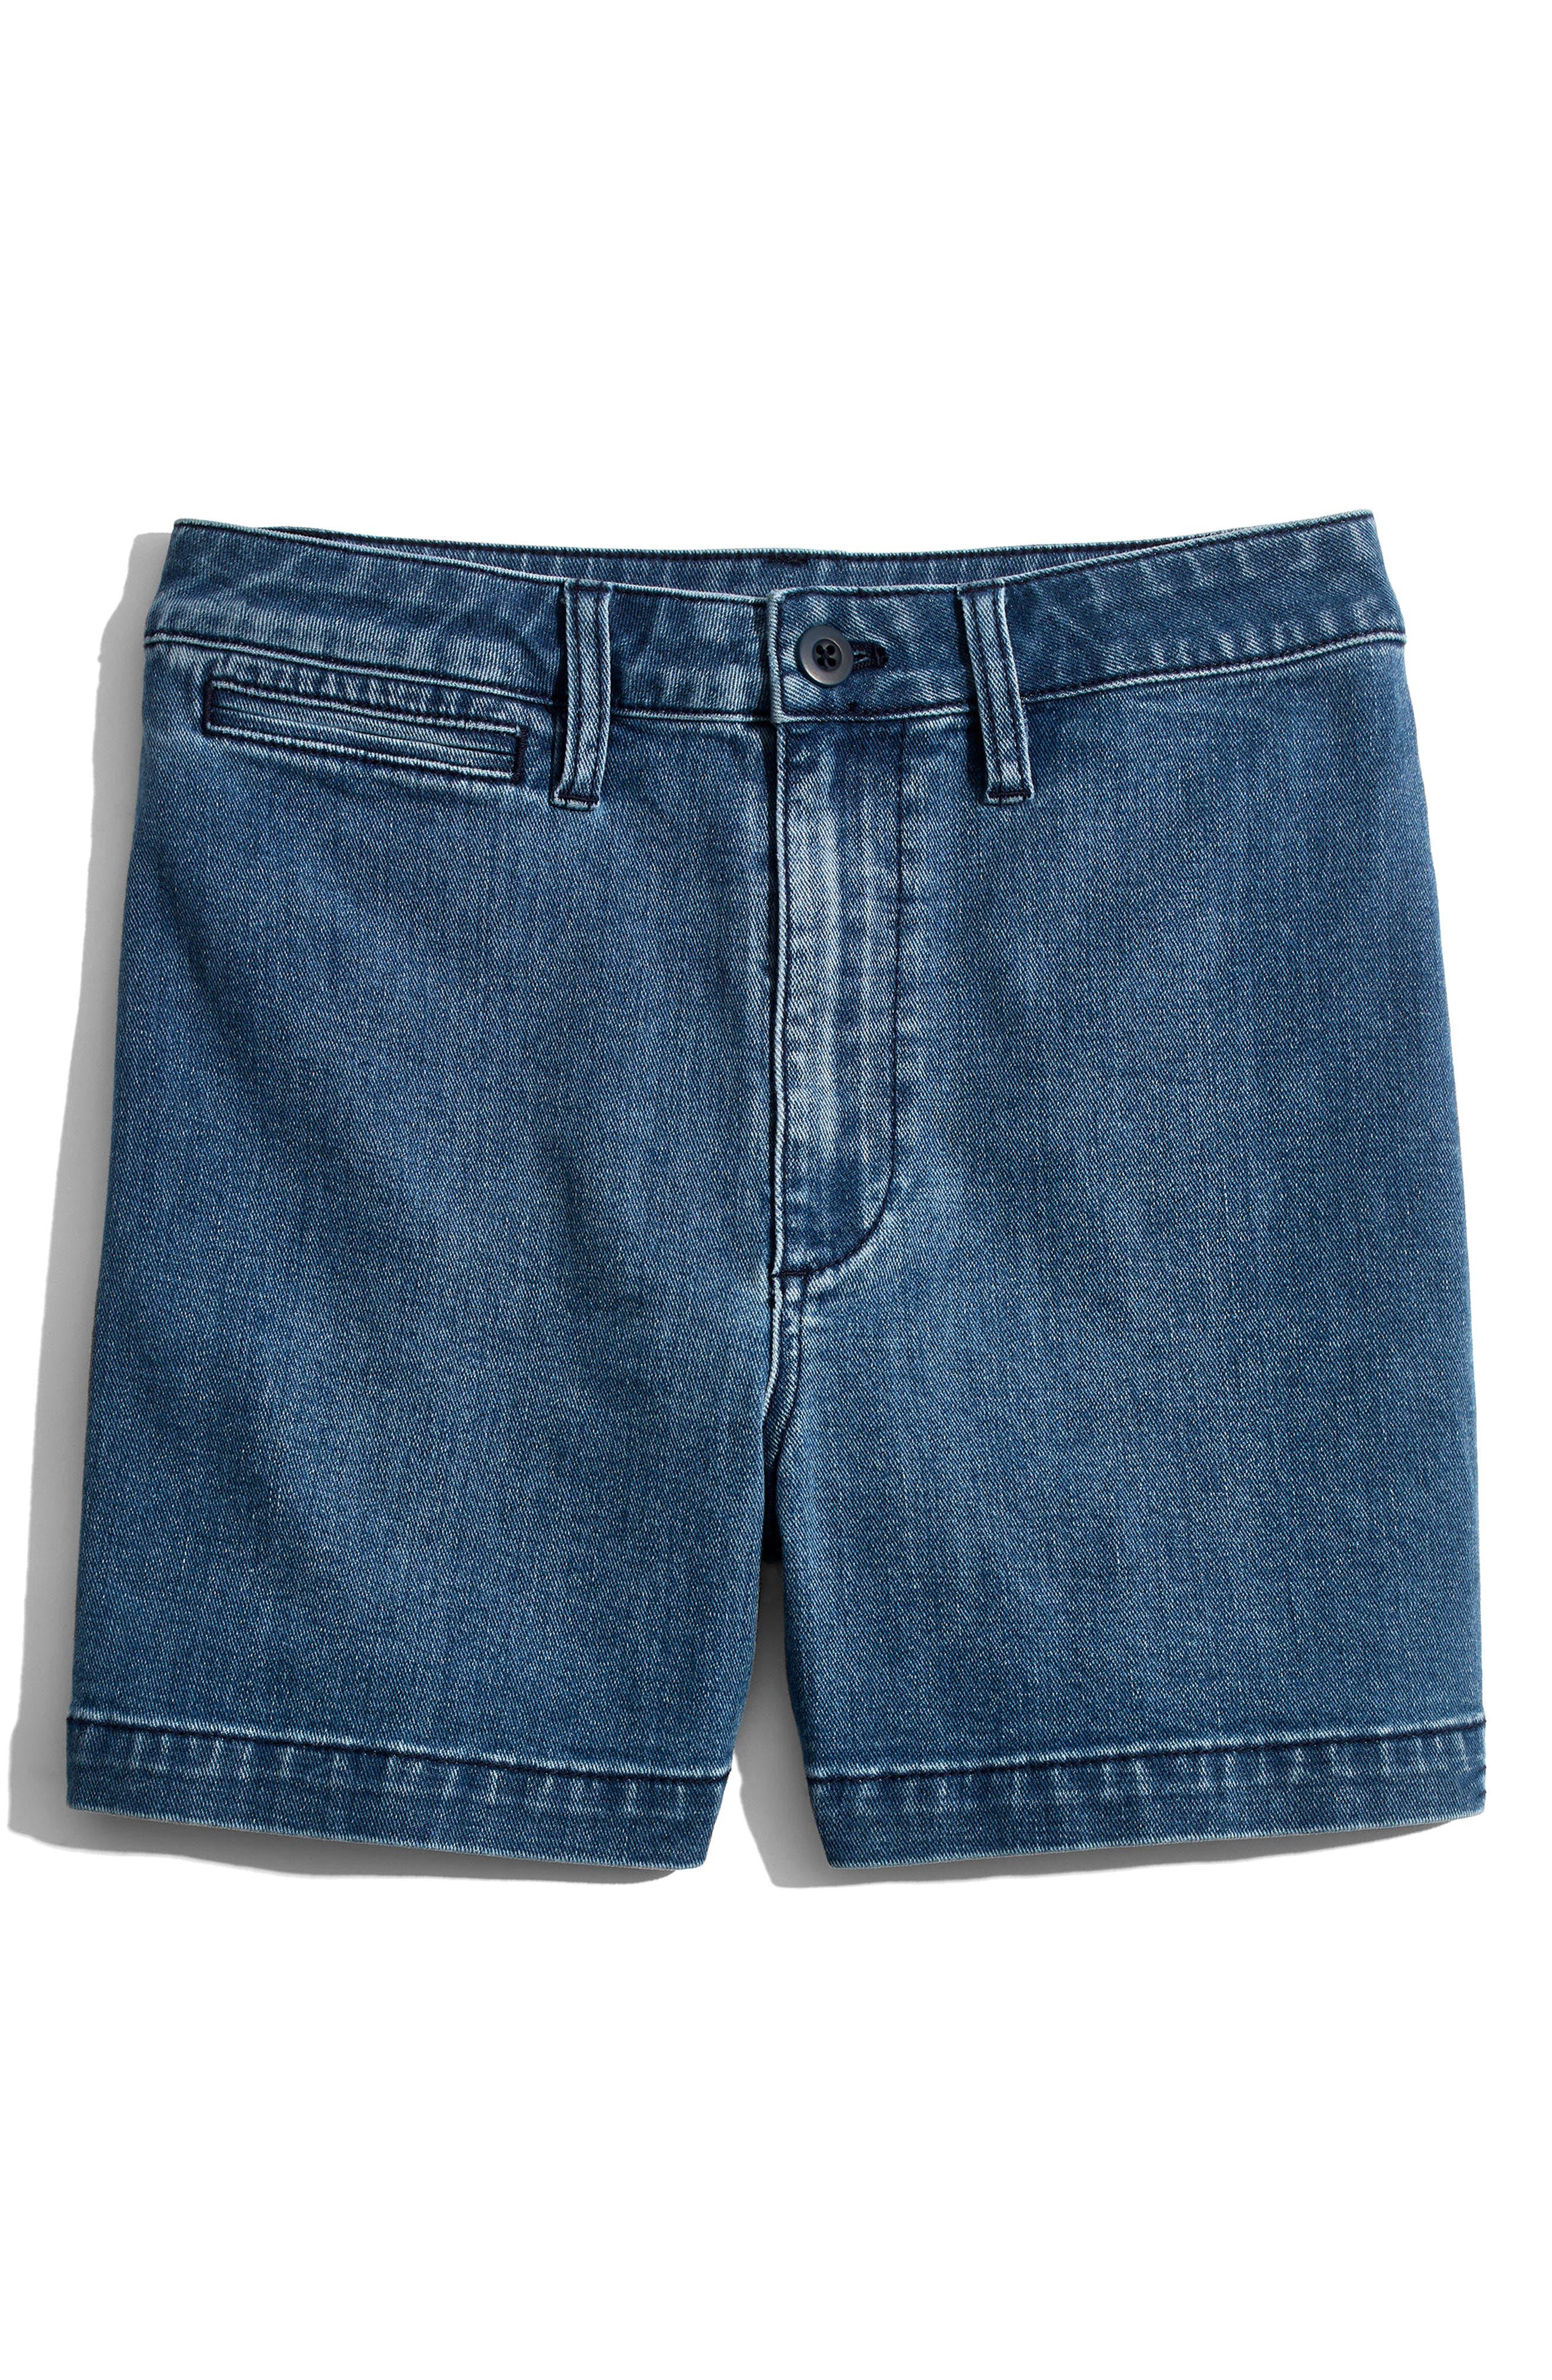 Emmett High Waist Denim Shorts,                             Alternate thumbnail 4, color,                             ROSALIE